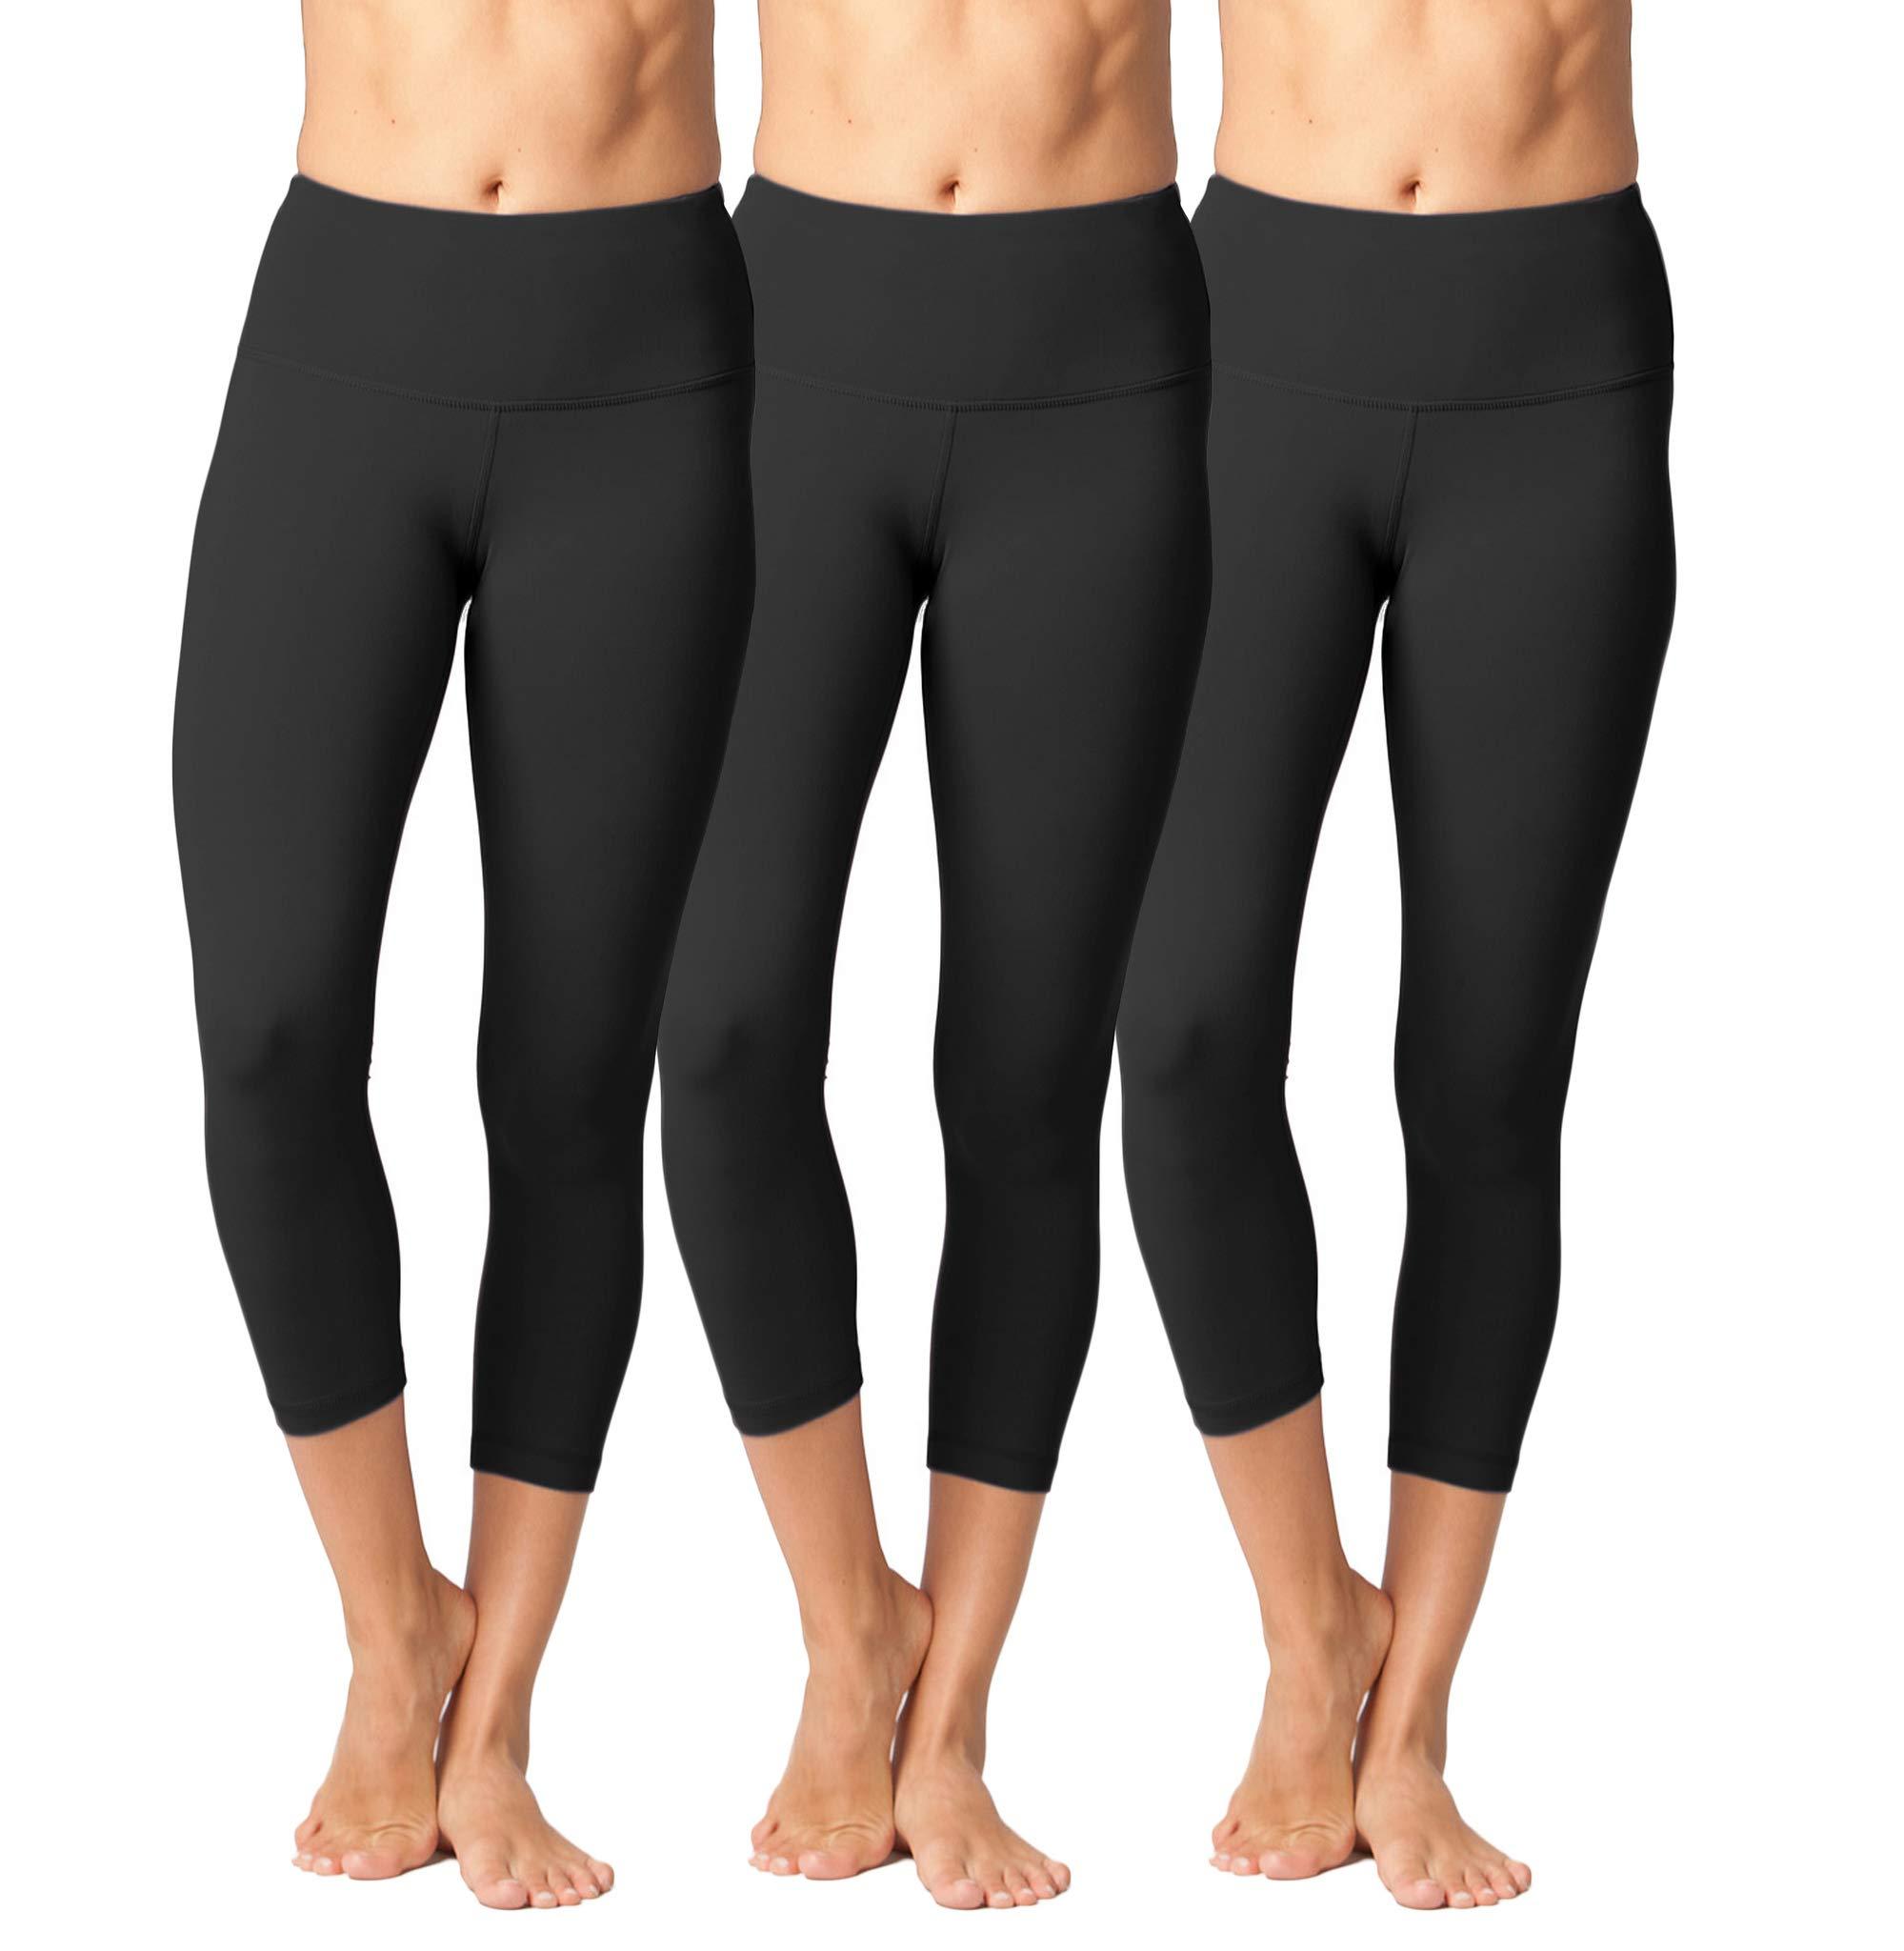 Yogalicious High Waist Ultra Soft Lightweight Capris - High Rise Yoga Pants (XS, Black 3 Pack)